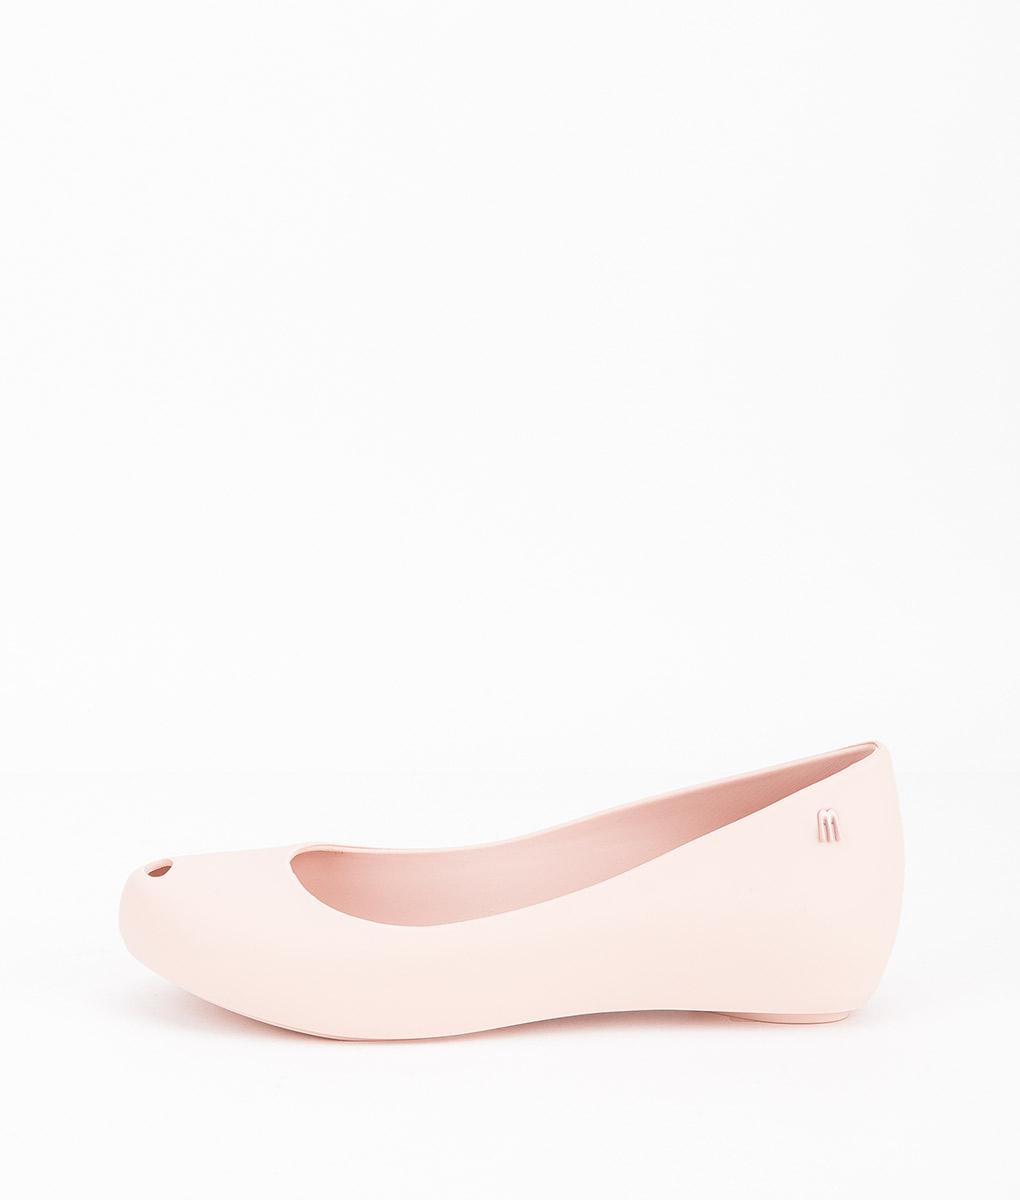 MELISSA Women Ballerinas 31976 ULTRAGIRL BASIC, Light Pink 59.99